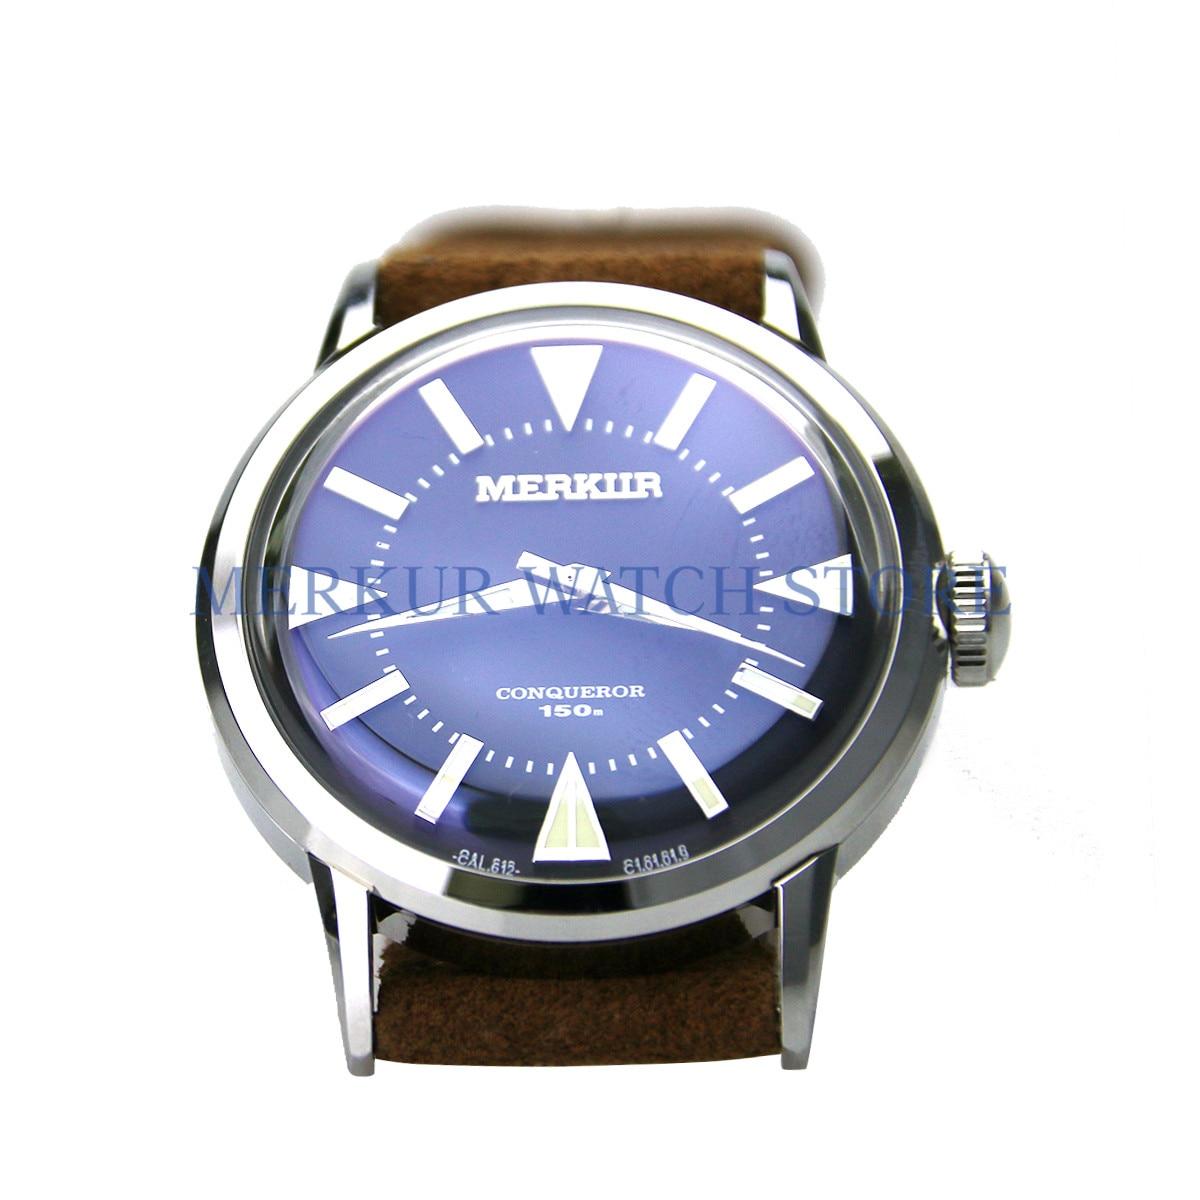 AD30 MERKUR Conqueror Vintage Dive Watch Homage First Generation Alpinist Sapphire Pop Glass 38S Japan